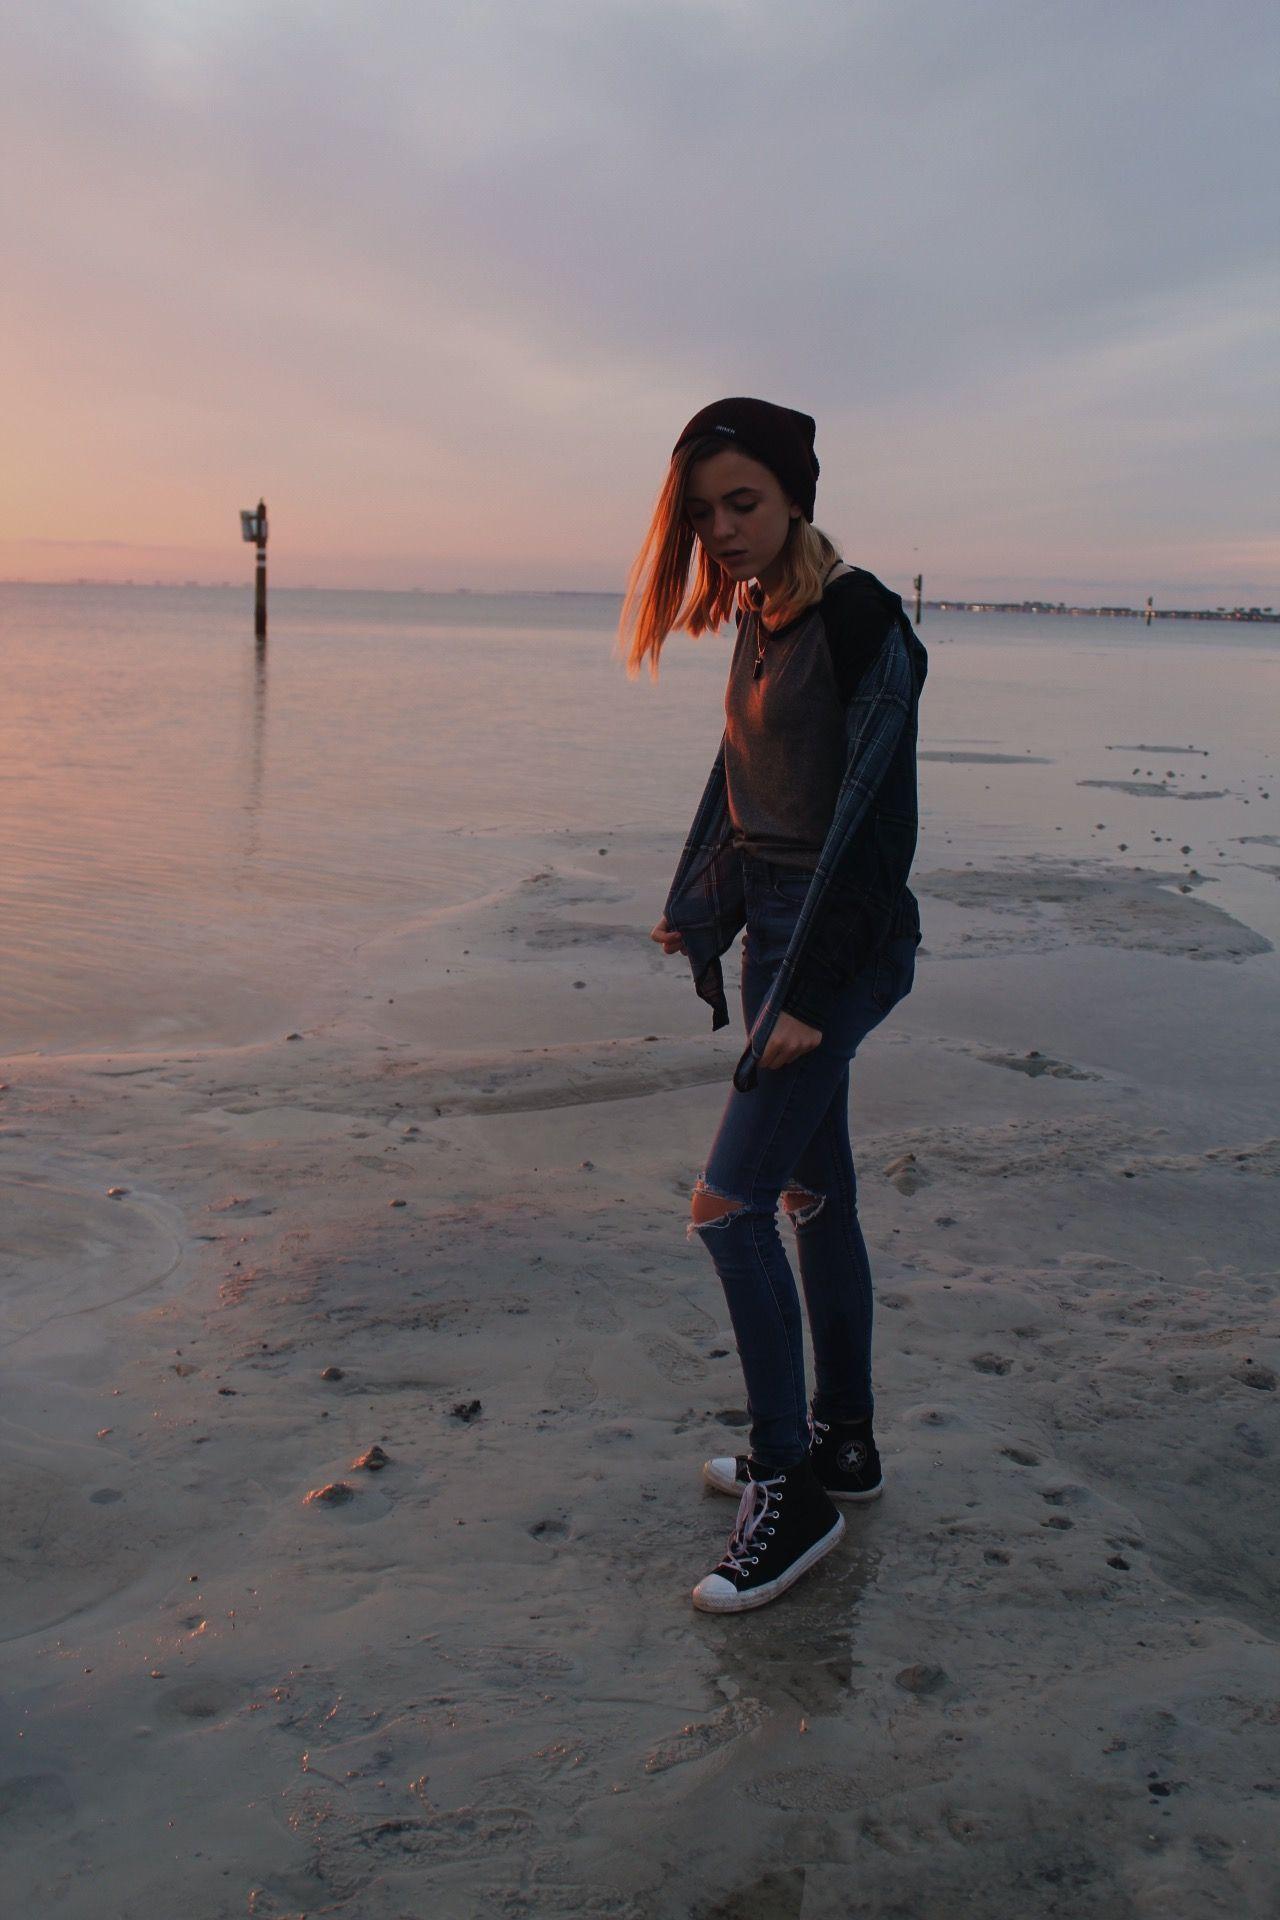 #beach #photography #aesthetic #tumblr #sunset # ...